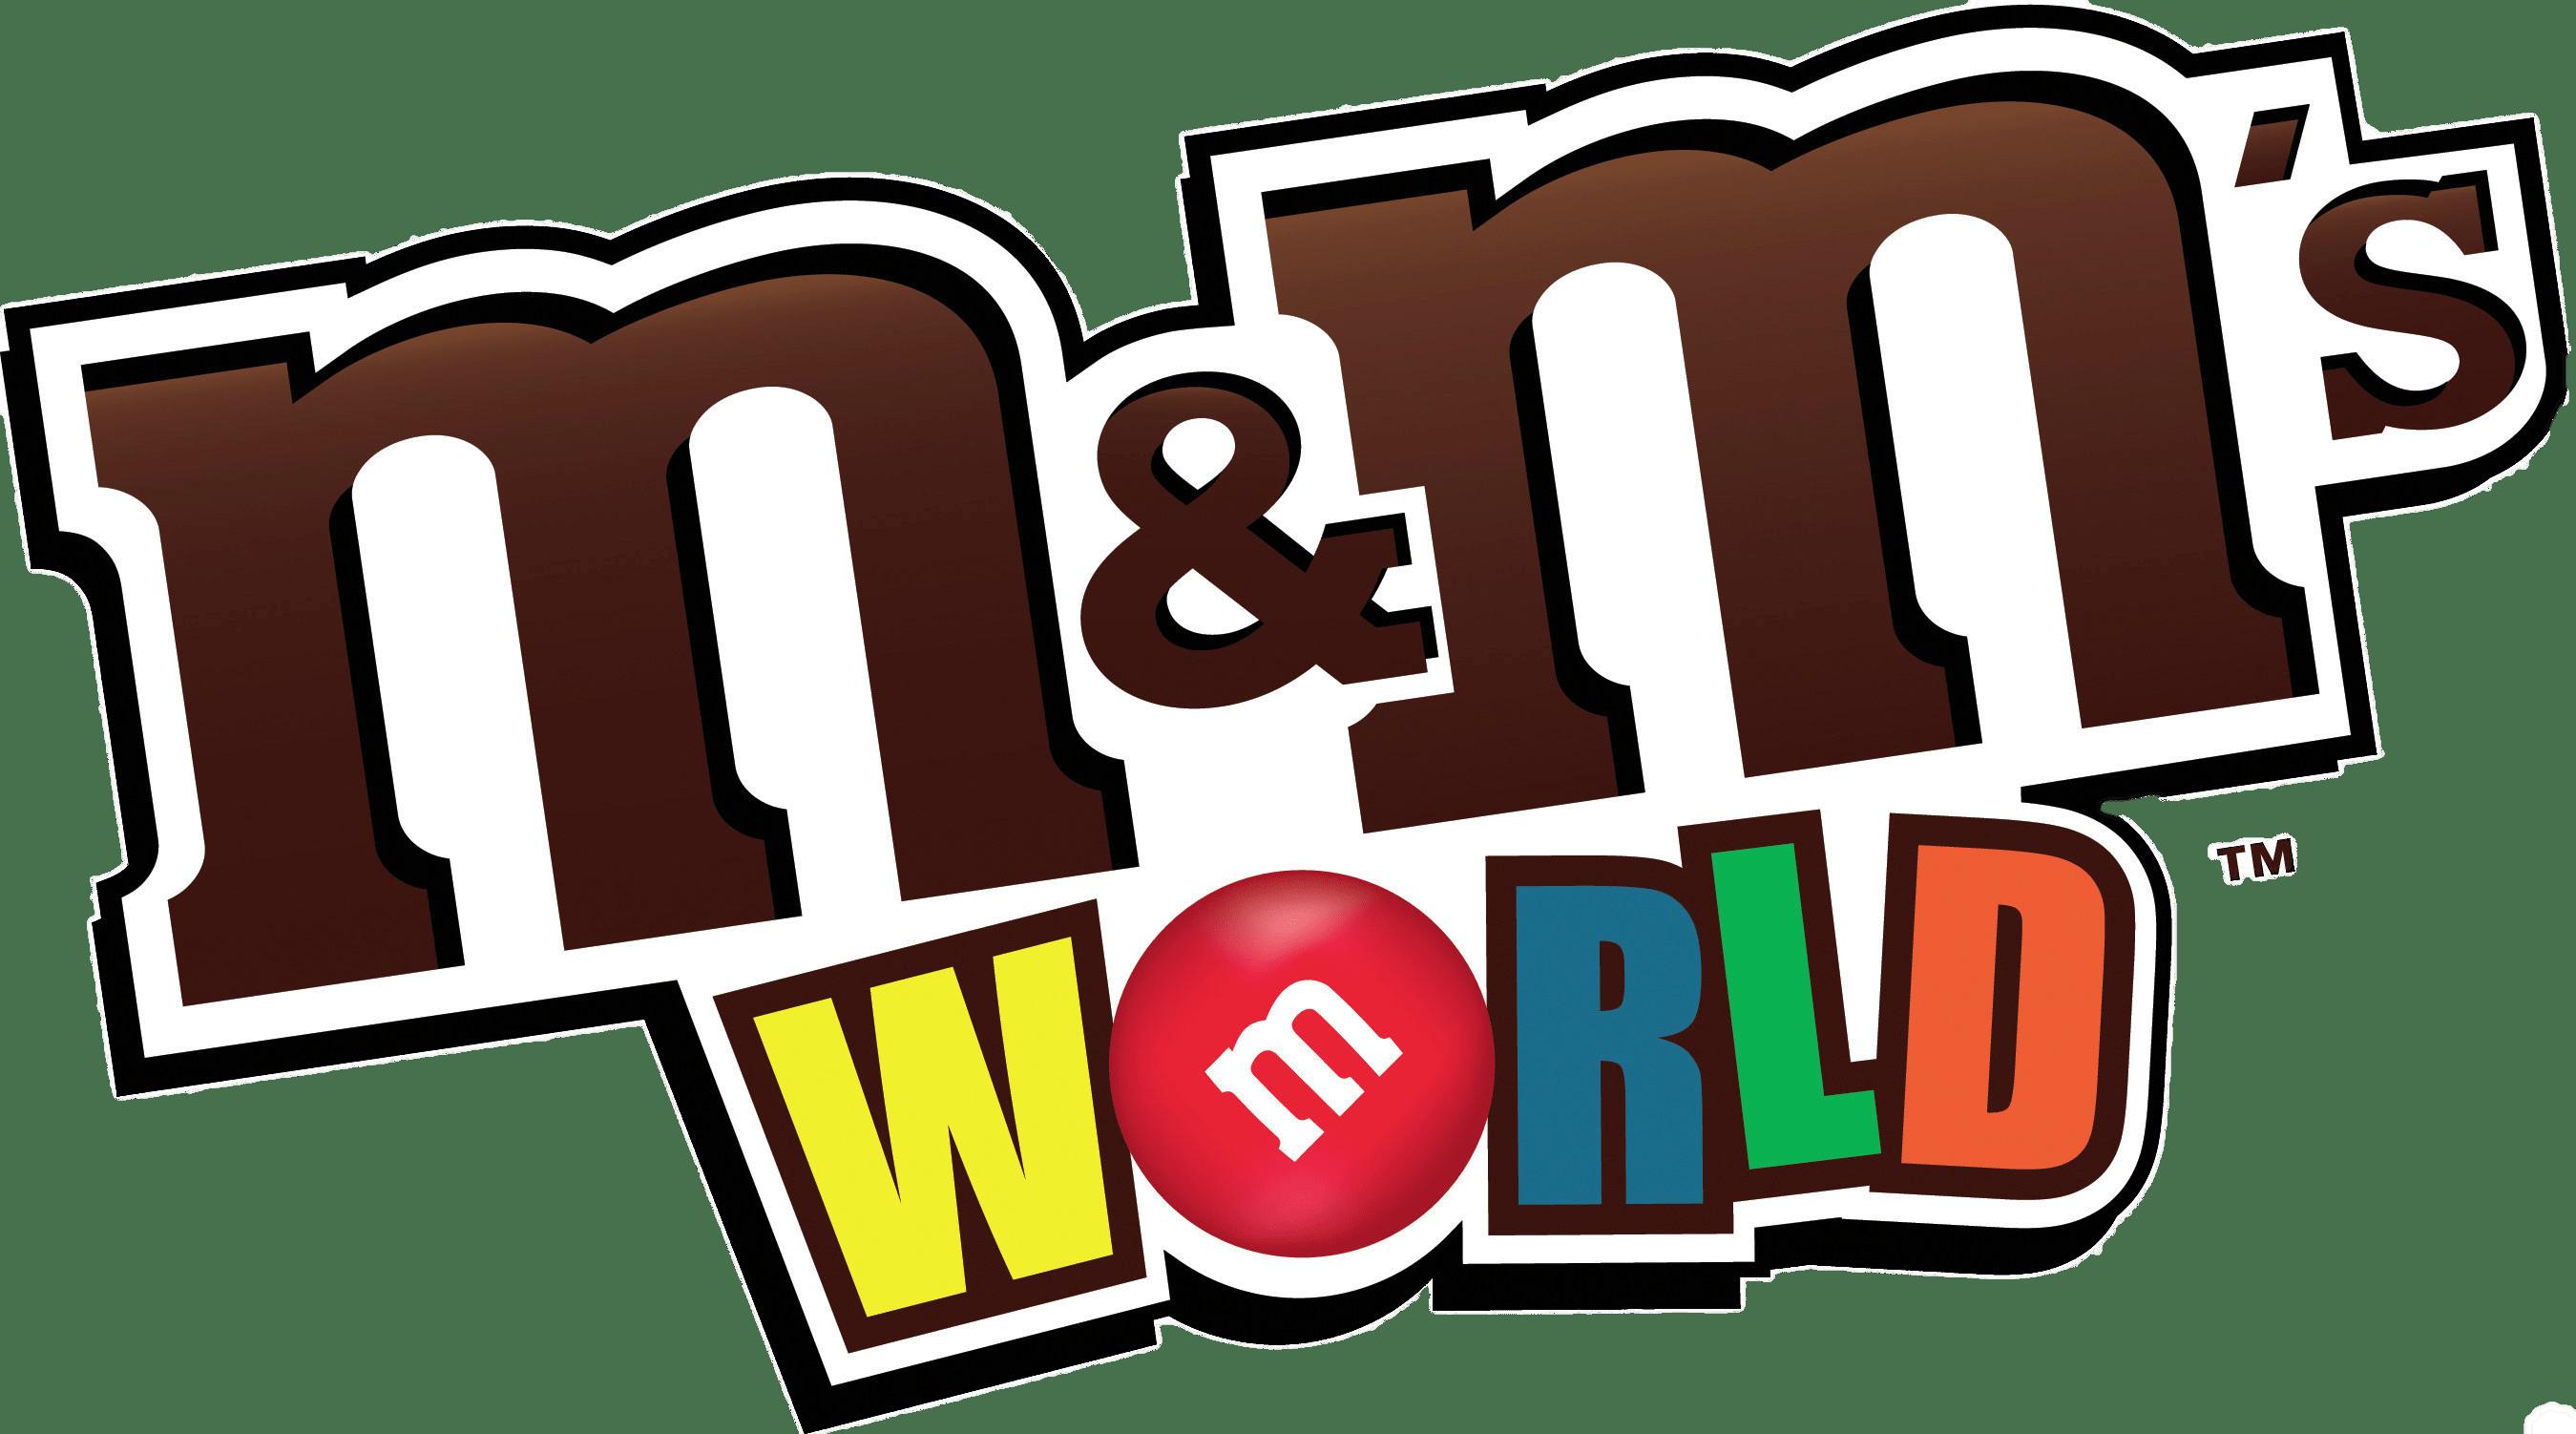 M s transparent png. Clipart world world logo